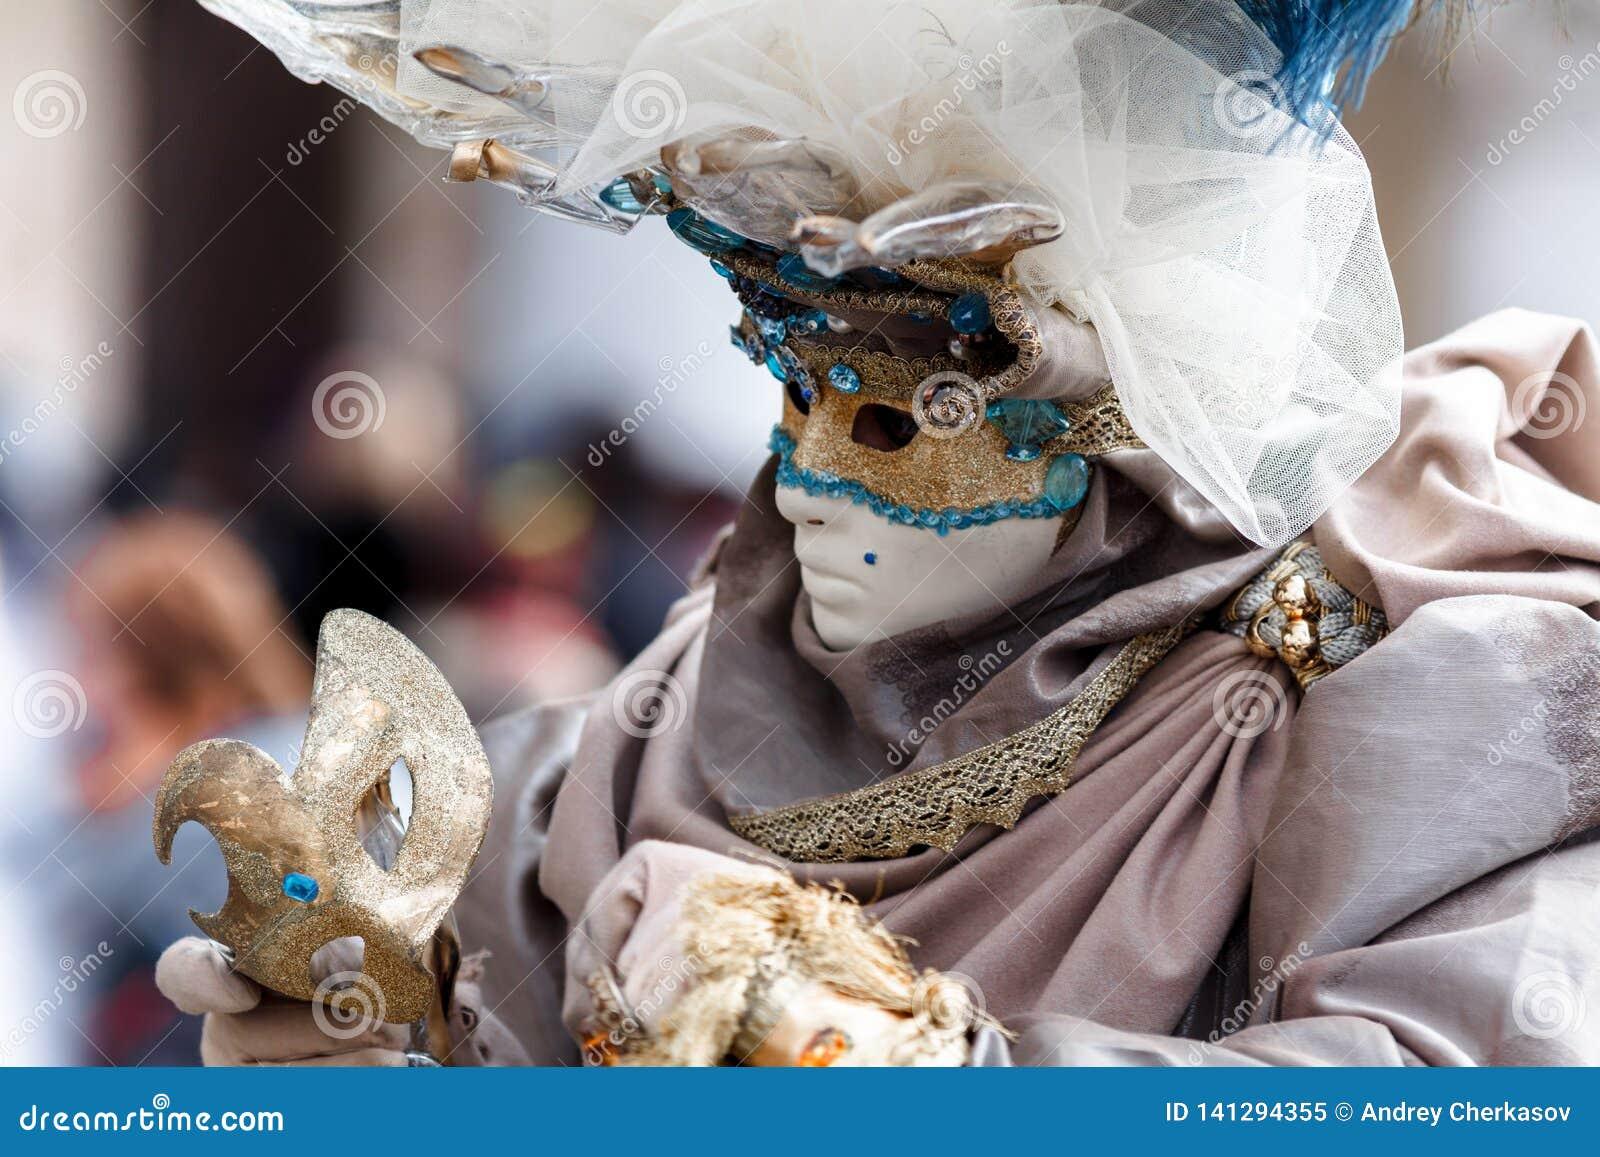 Venezia carnival art artist dress suit beauty mask face mistery sorrow